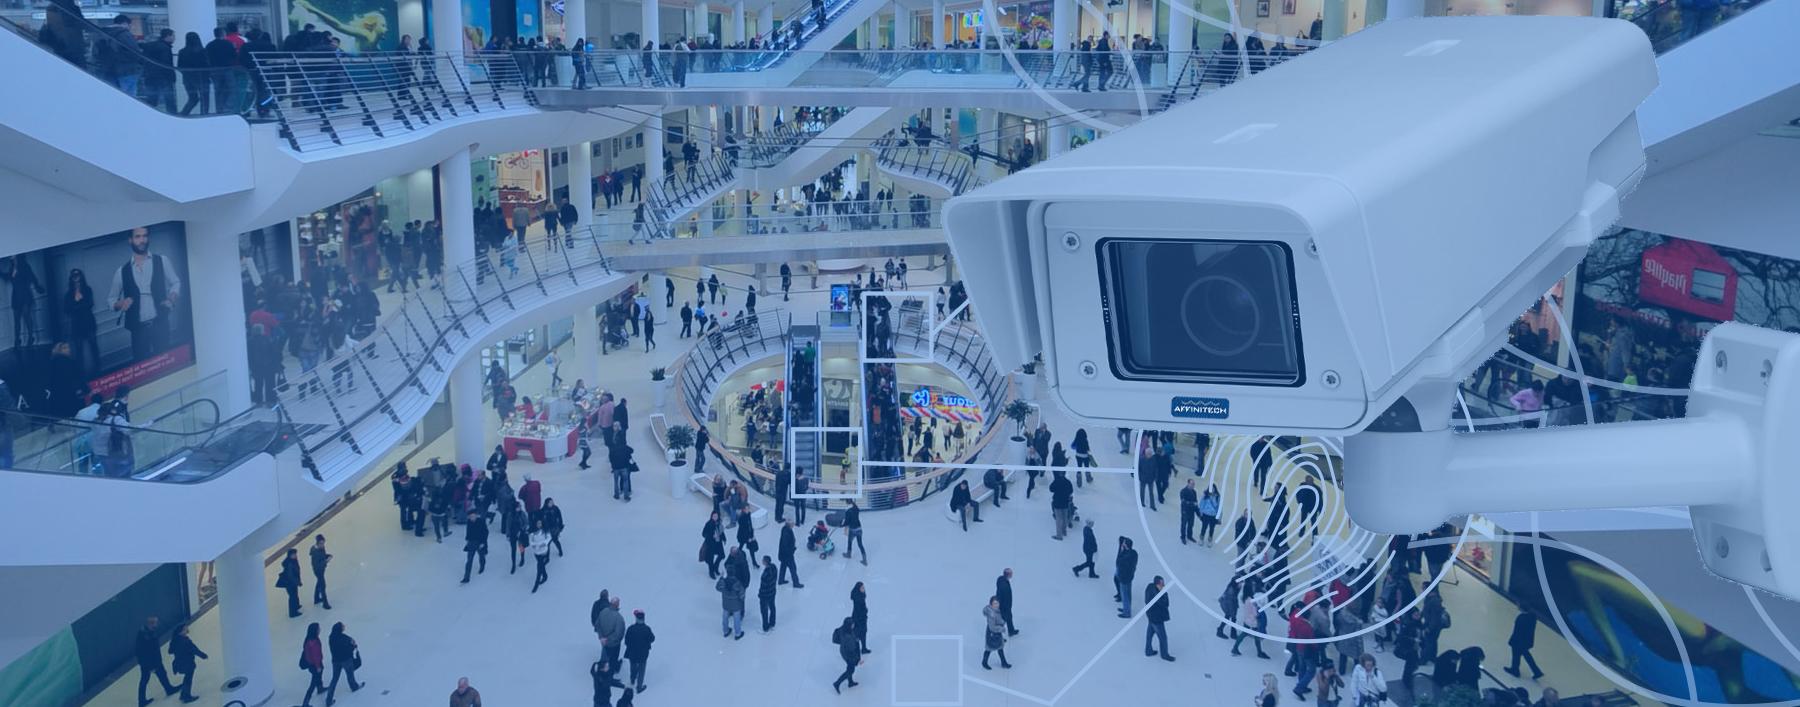 Integrated Security, Access Control, Security Camera, IP Camera